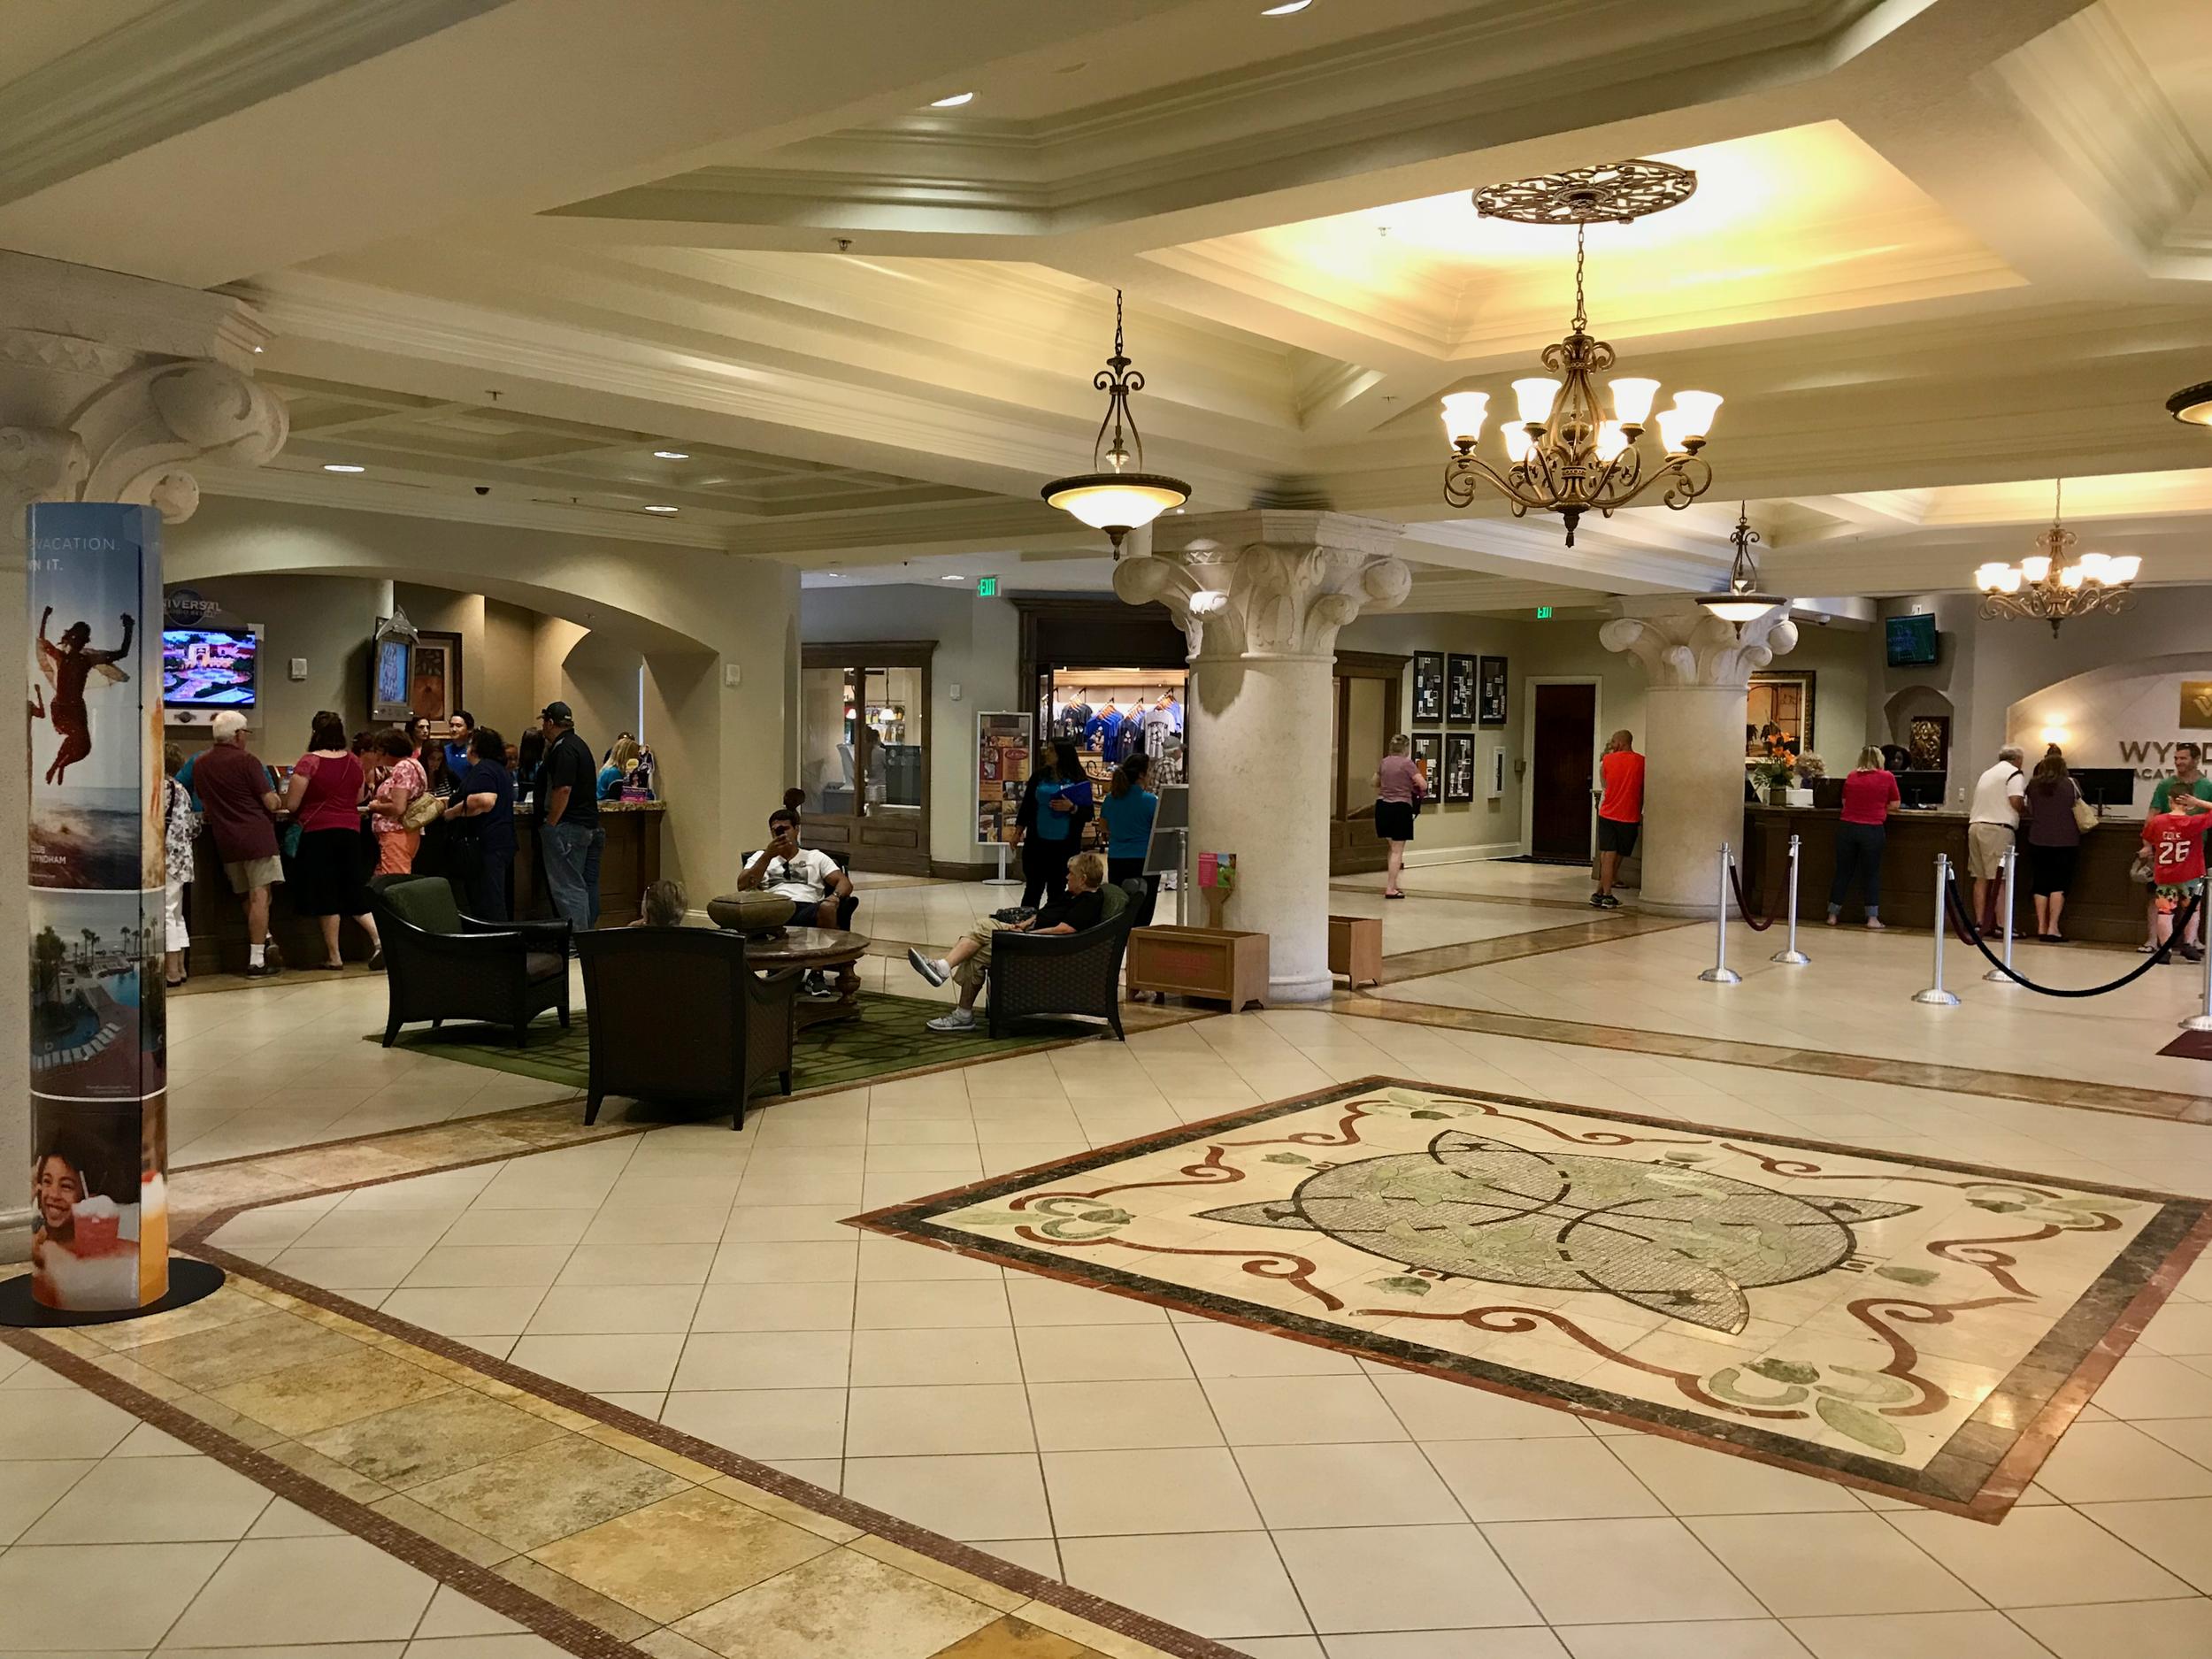 Wyndham Bonnet Creek Resort Visitors Center reception lobby